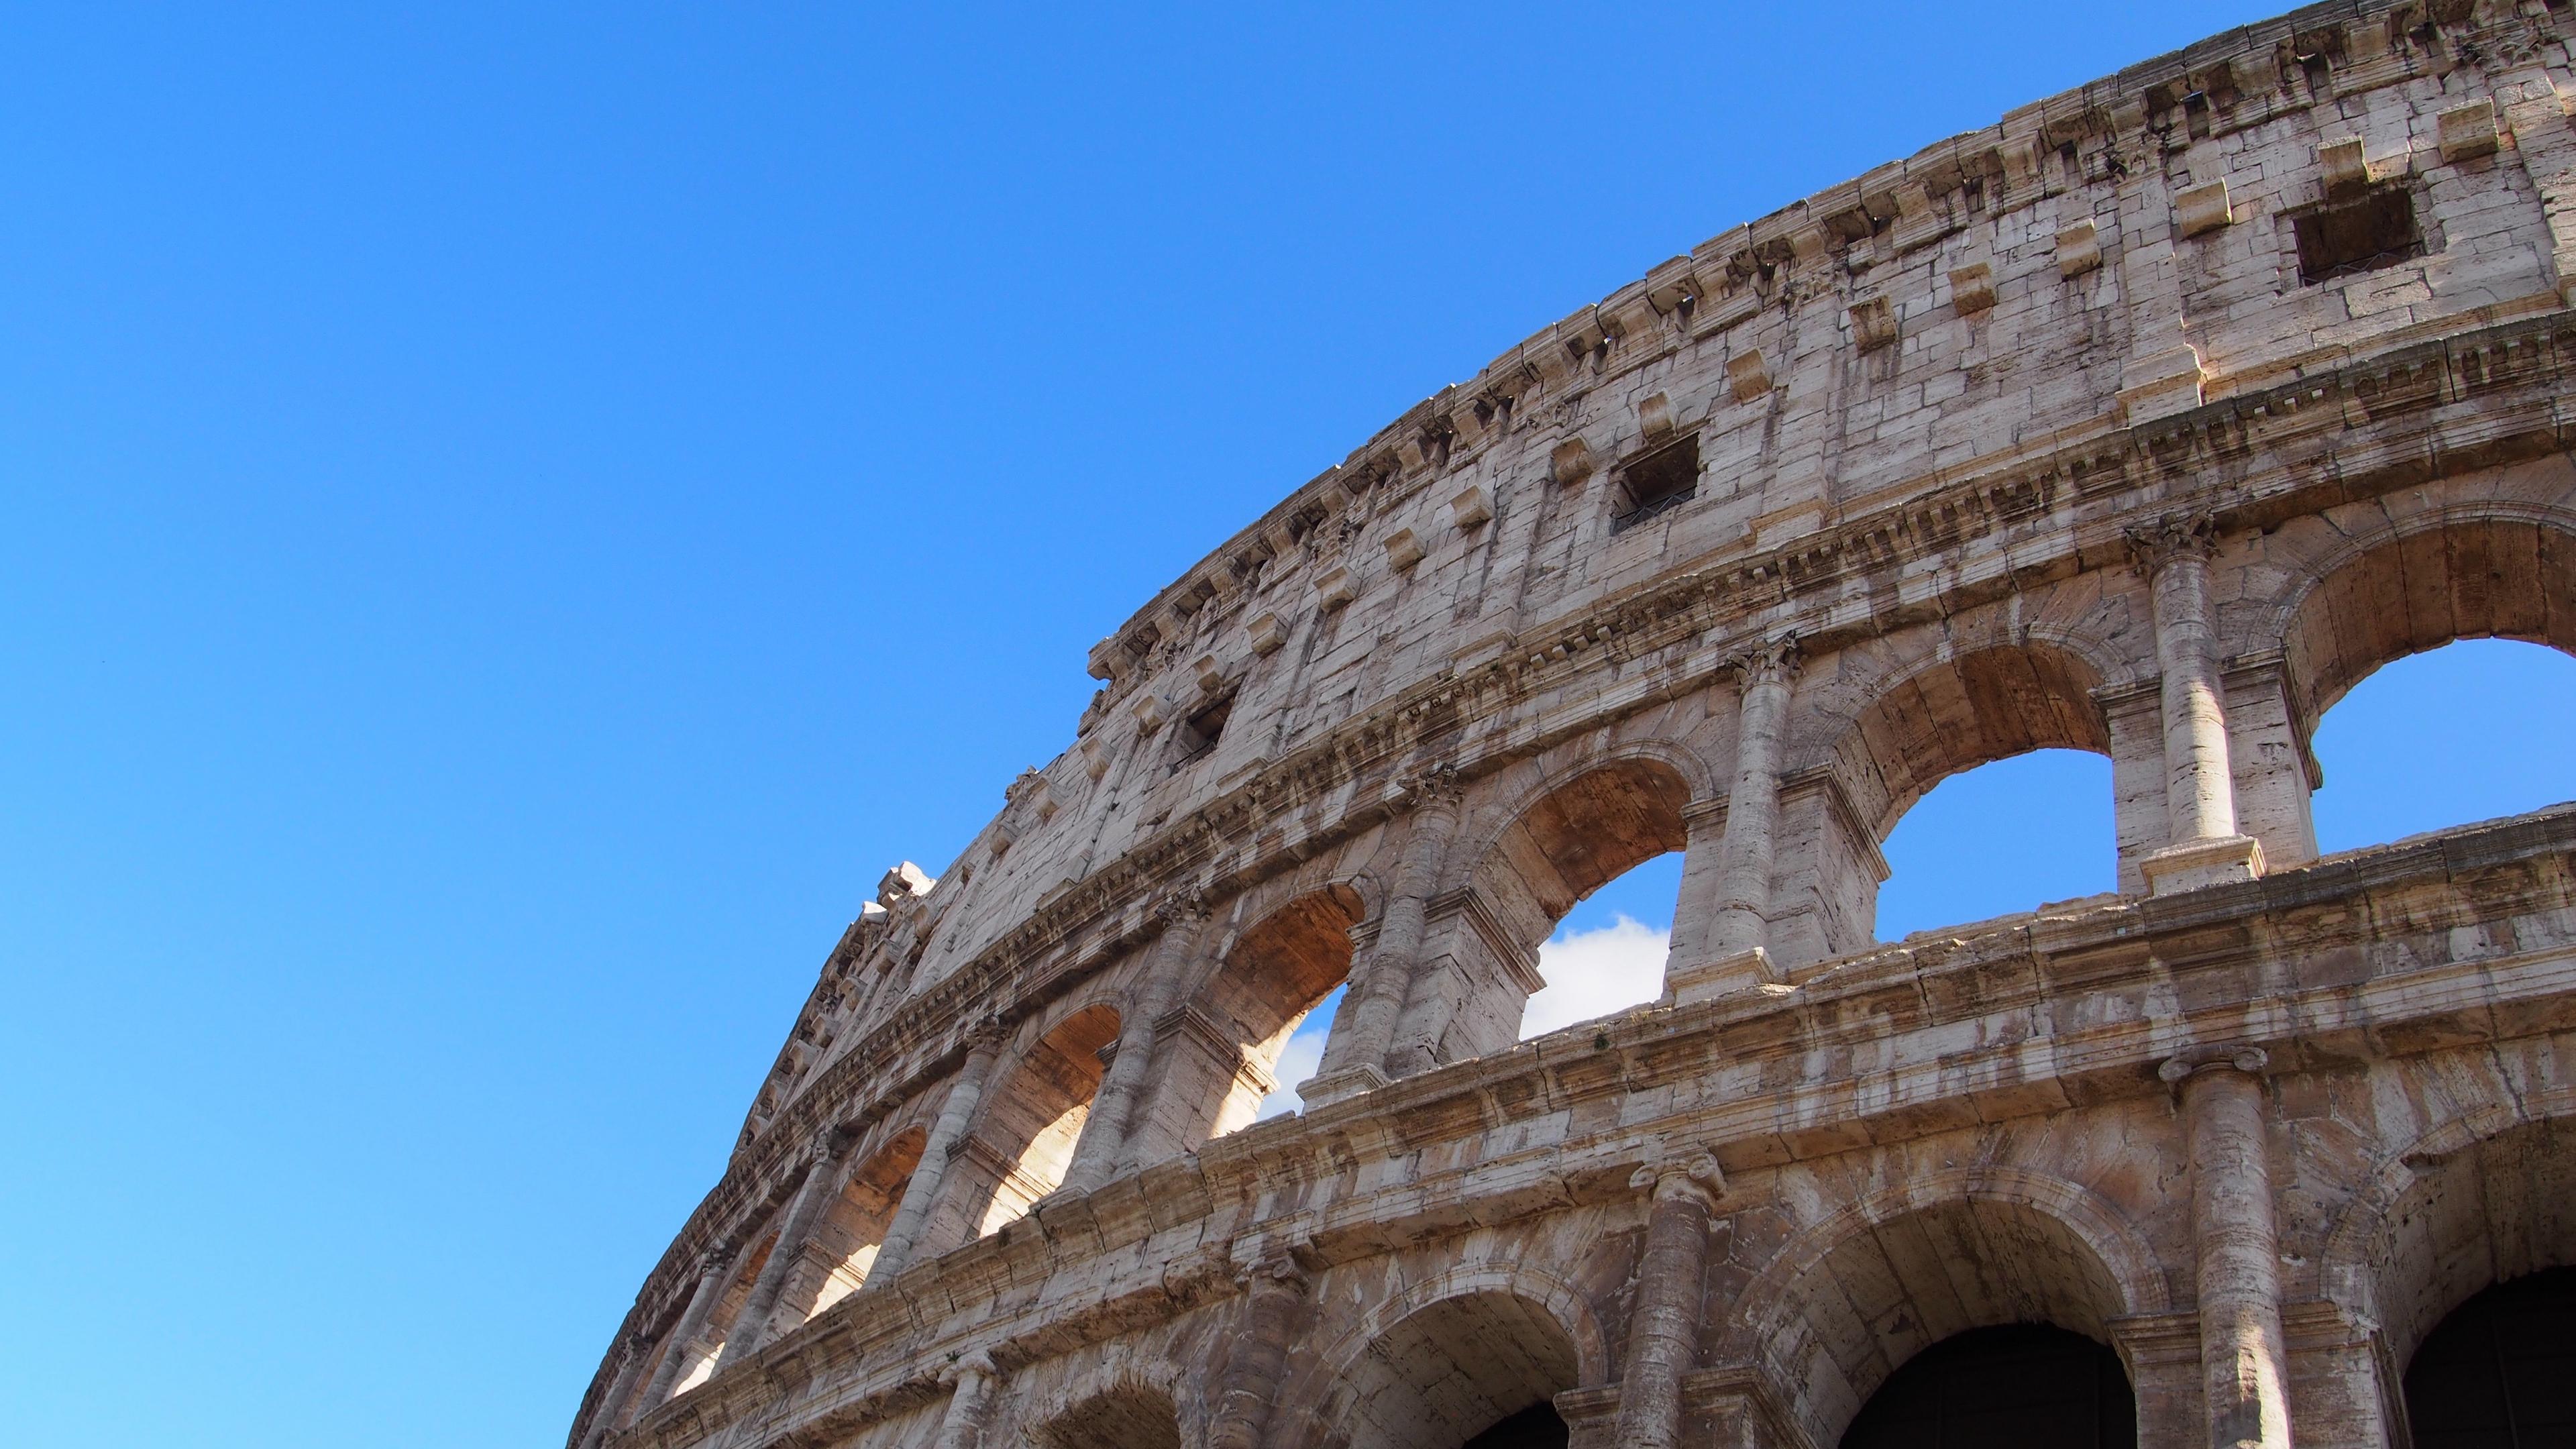 rome italy coliseum architecture 4k 1538065246 - rome, italy, coliseum, architecture 4k - Rome, Italy, coliseum